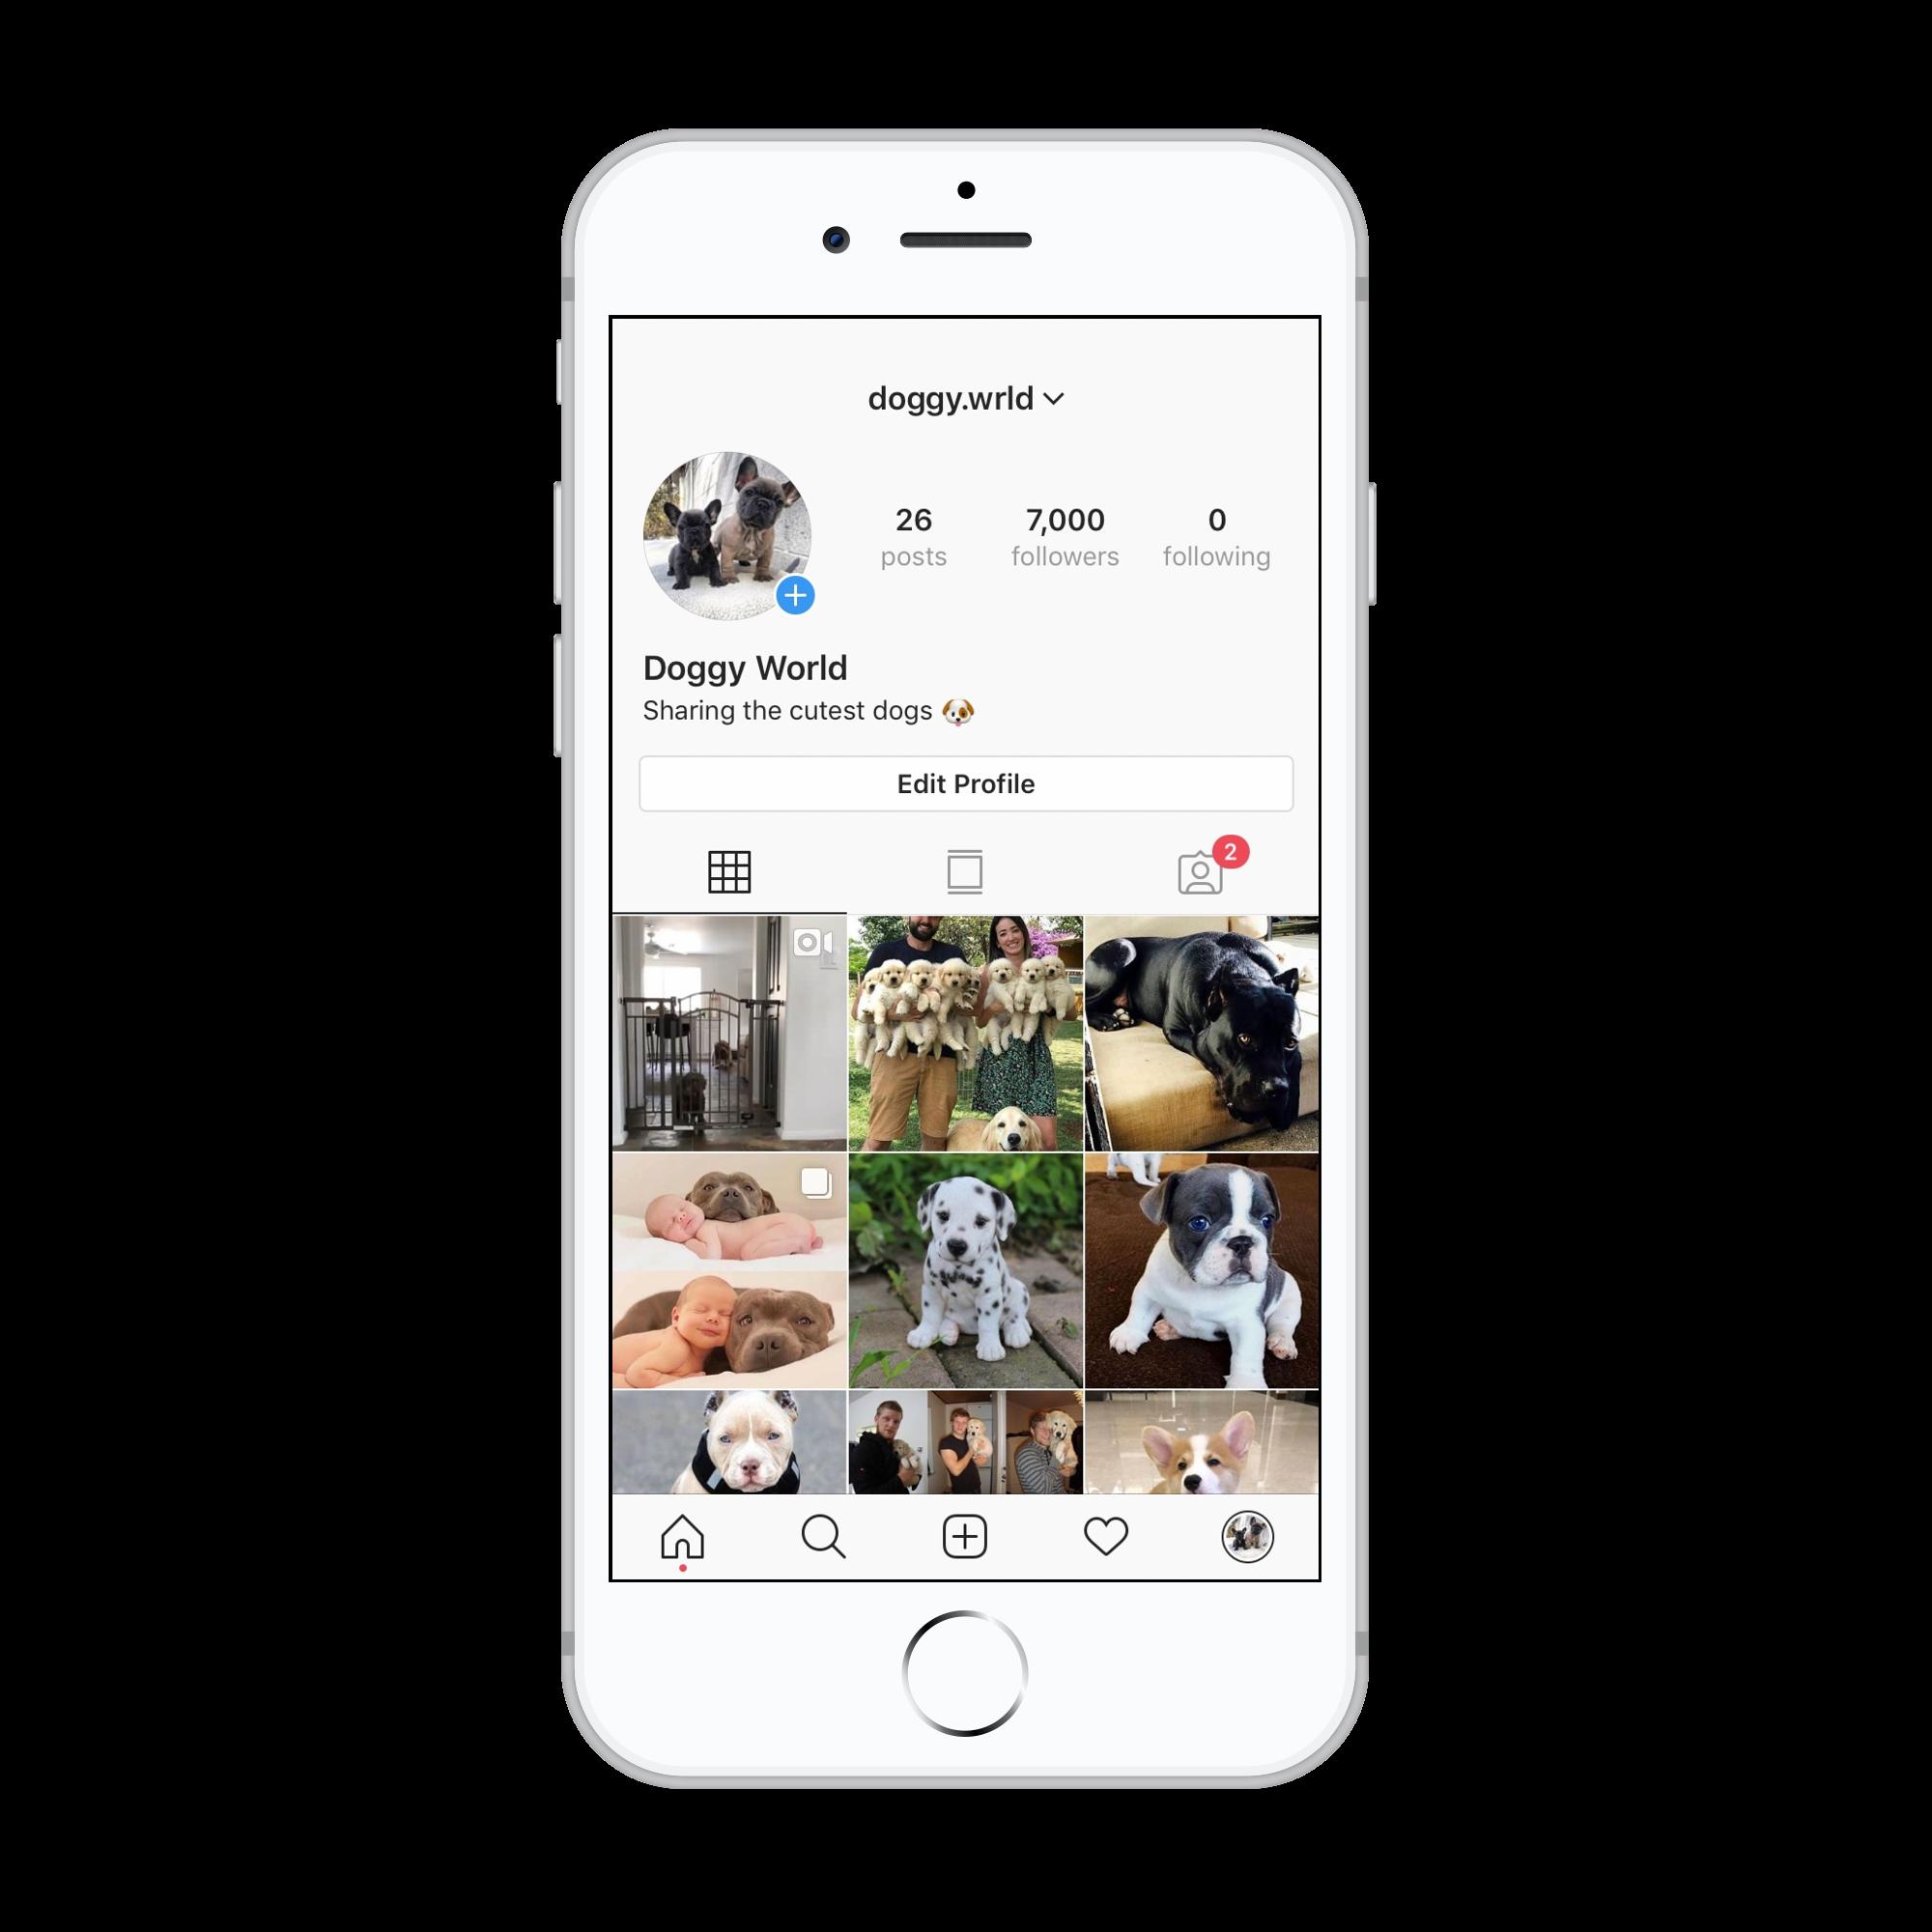 7k Dogs Instagram account